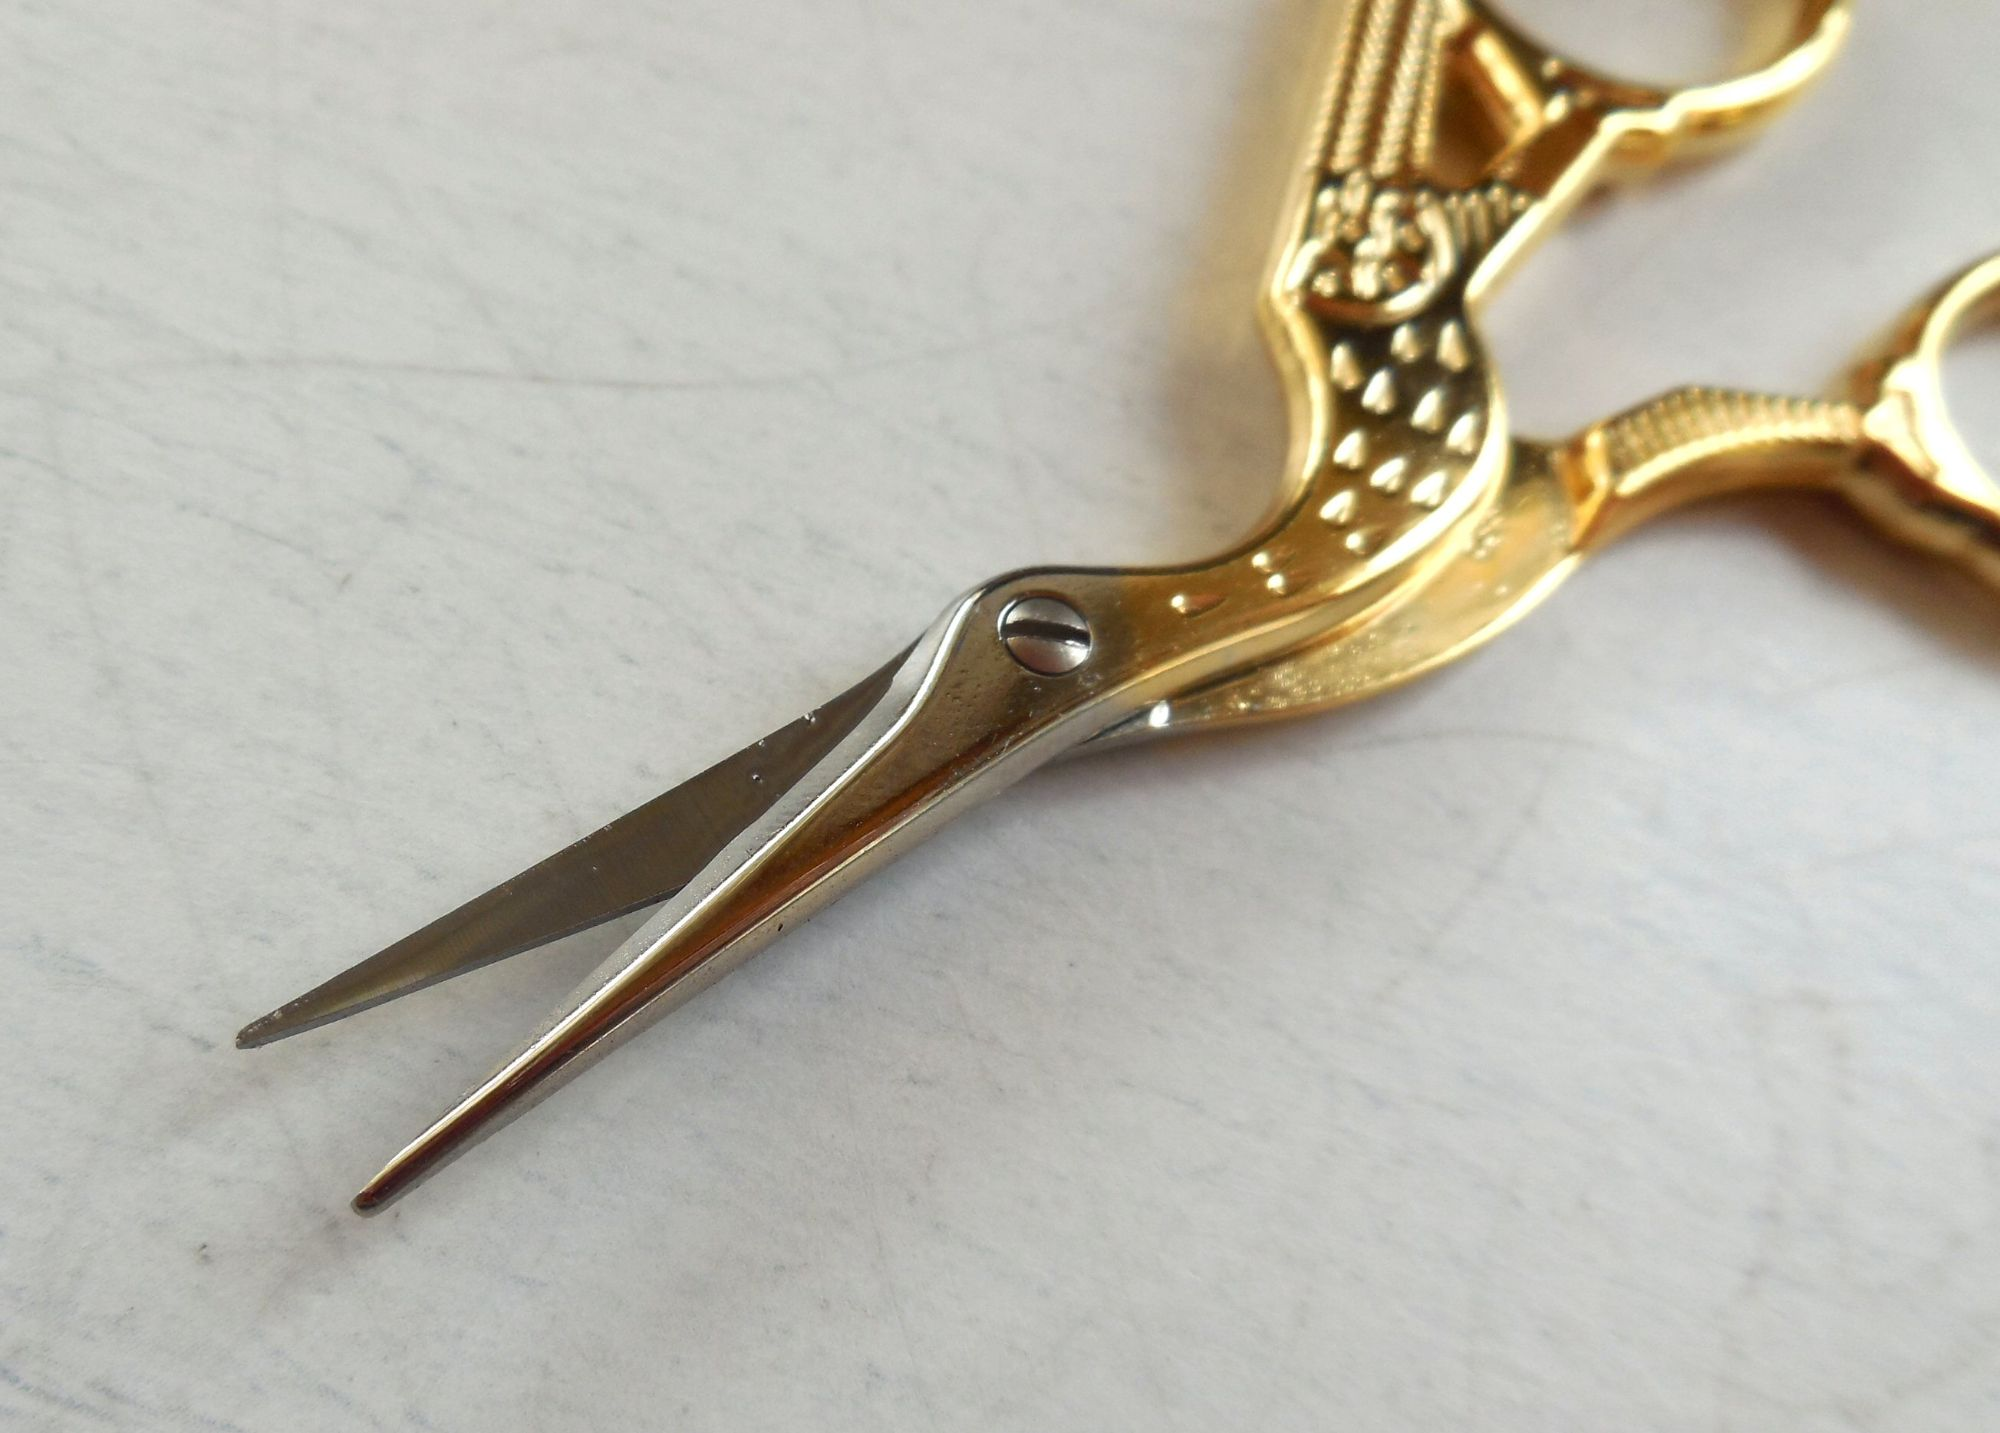 Stork scissors blade